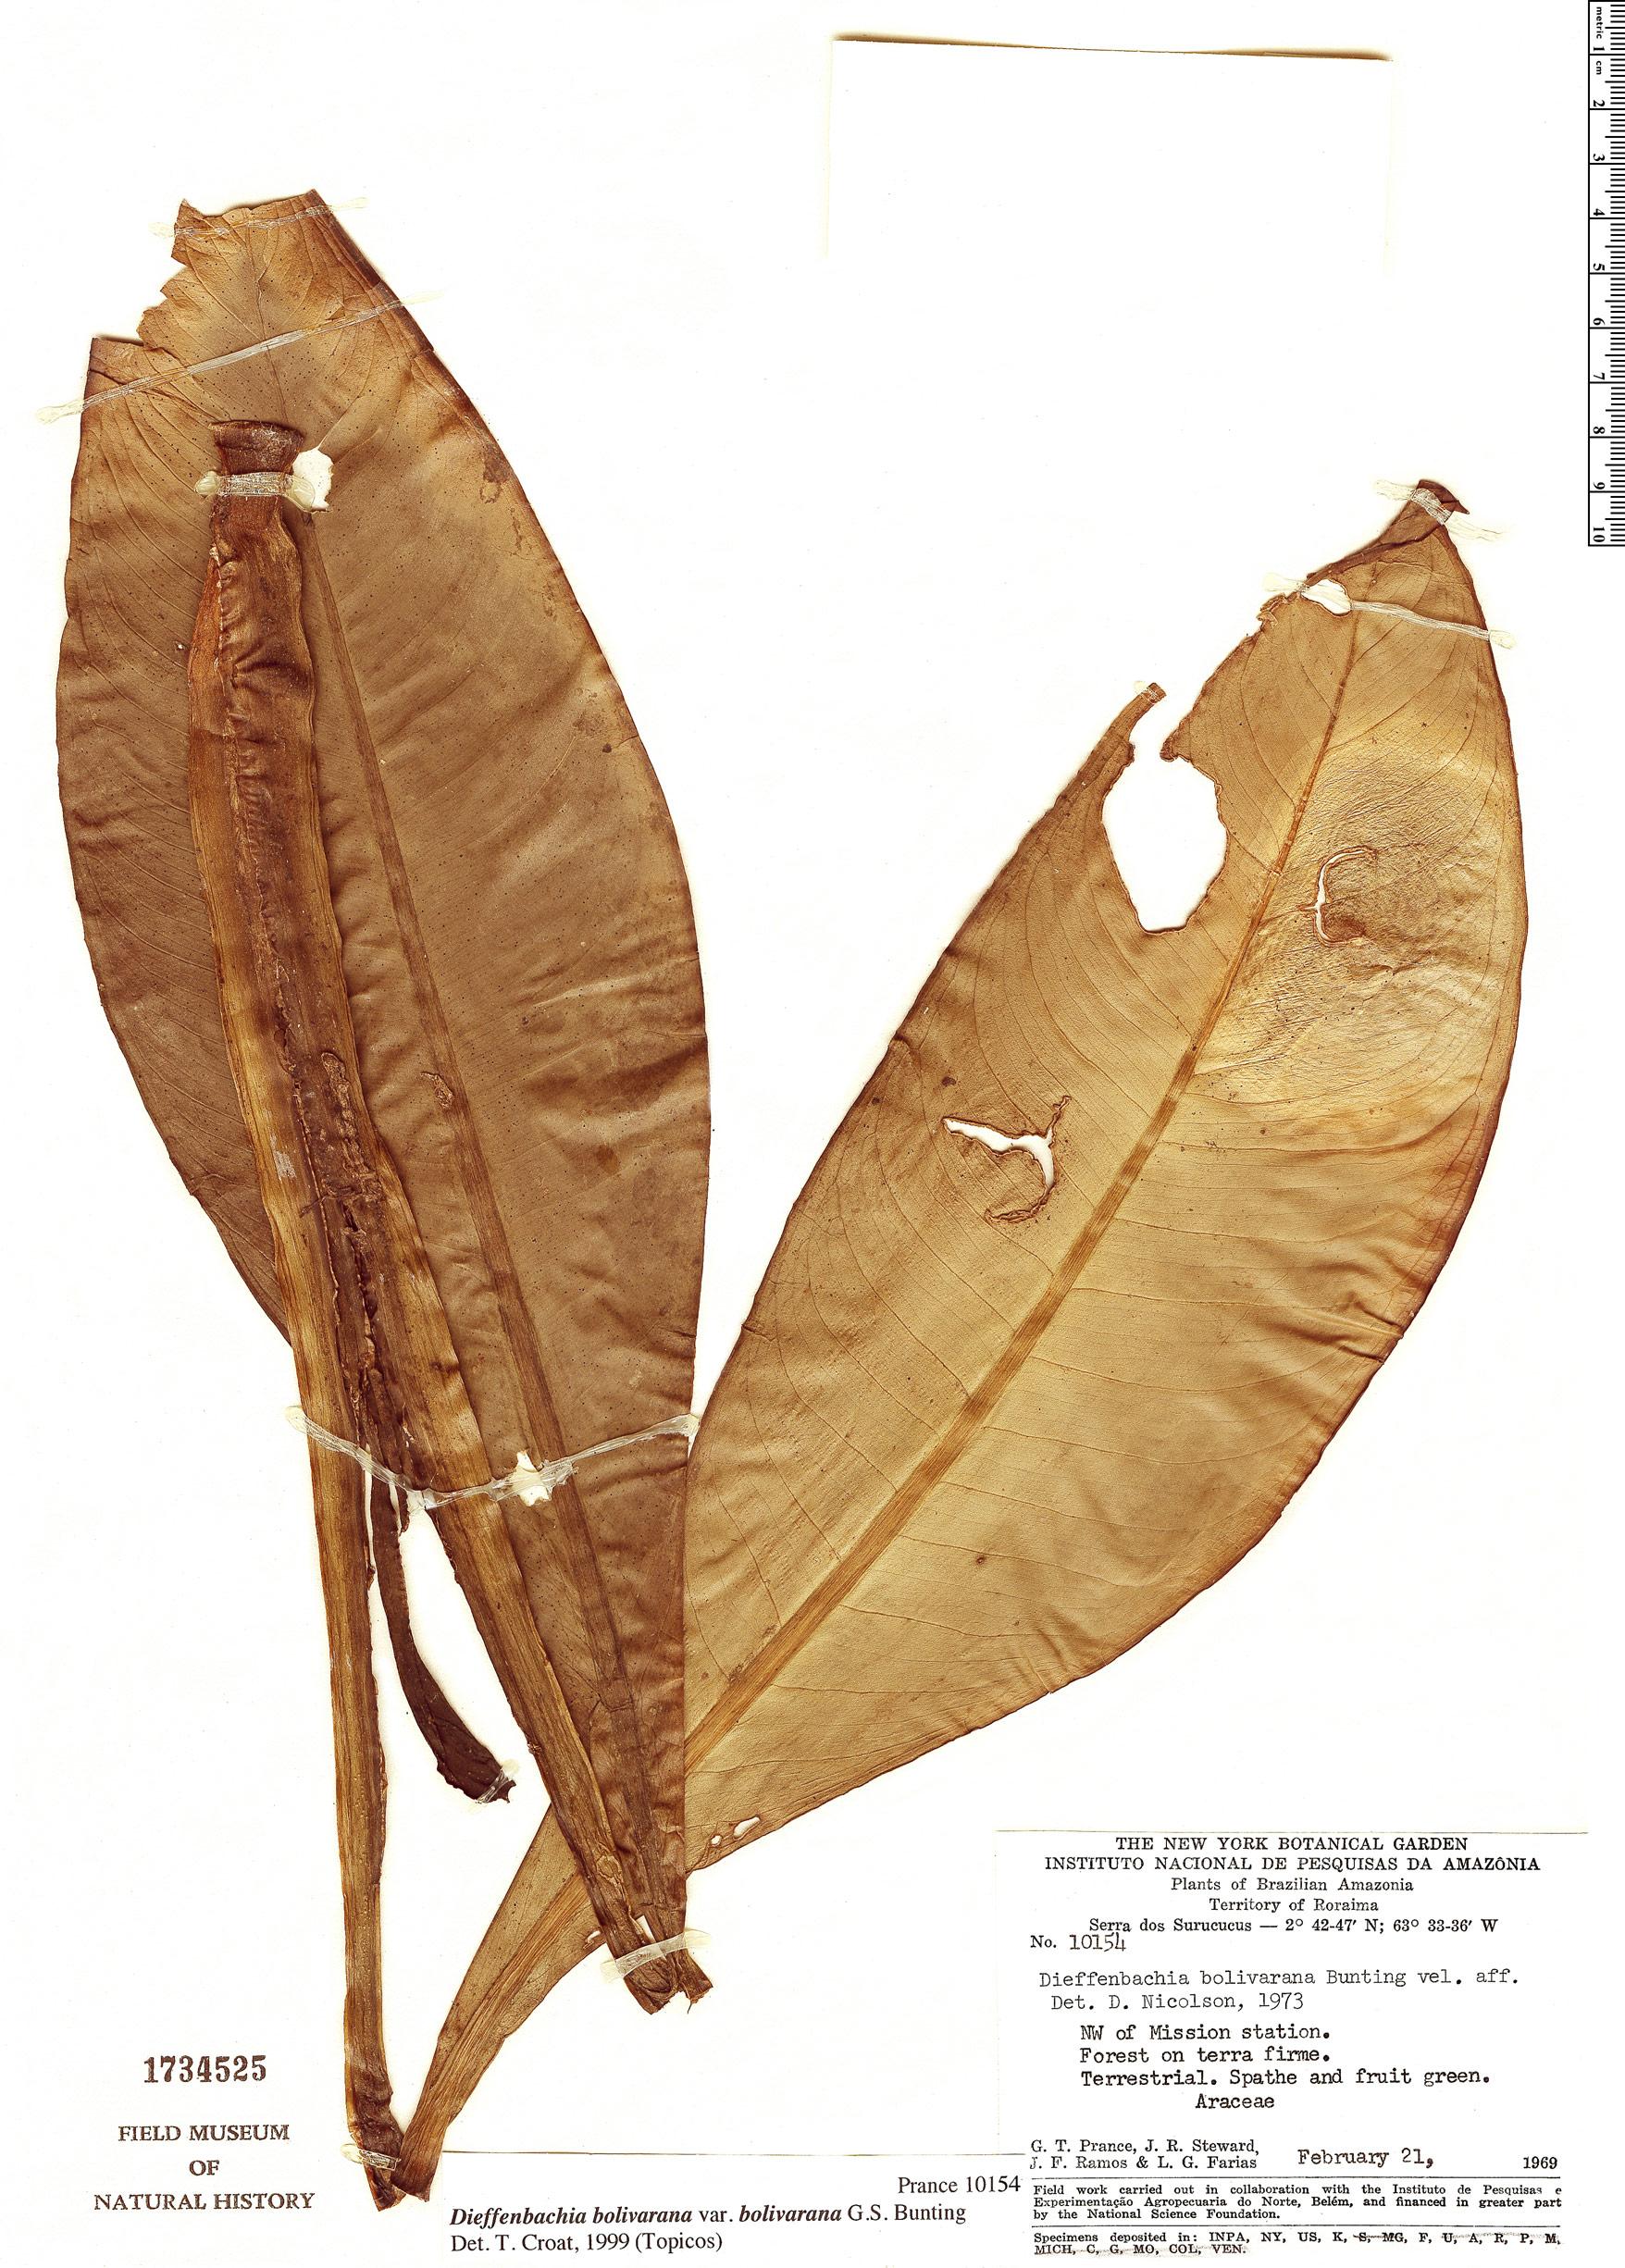 Specimen: Dieffenbachia bolivarana